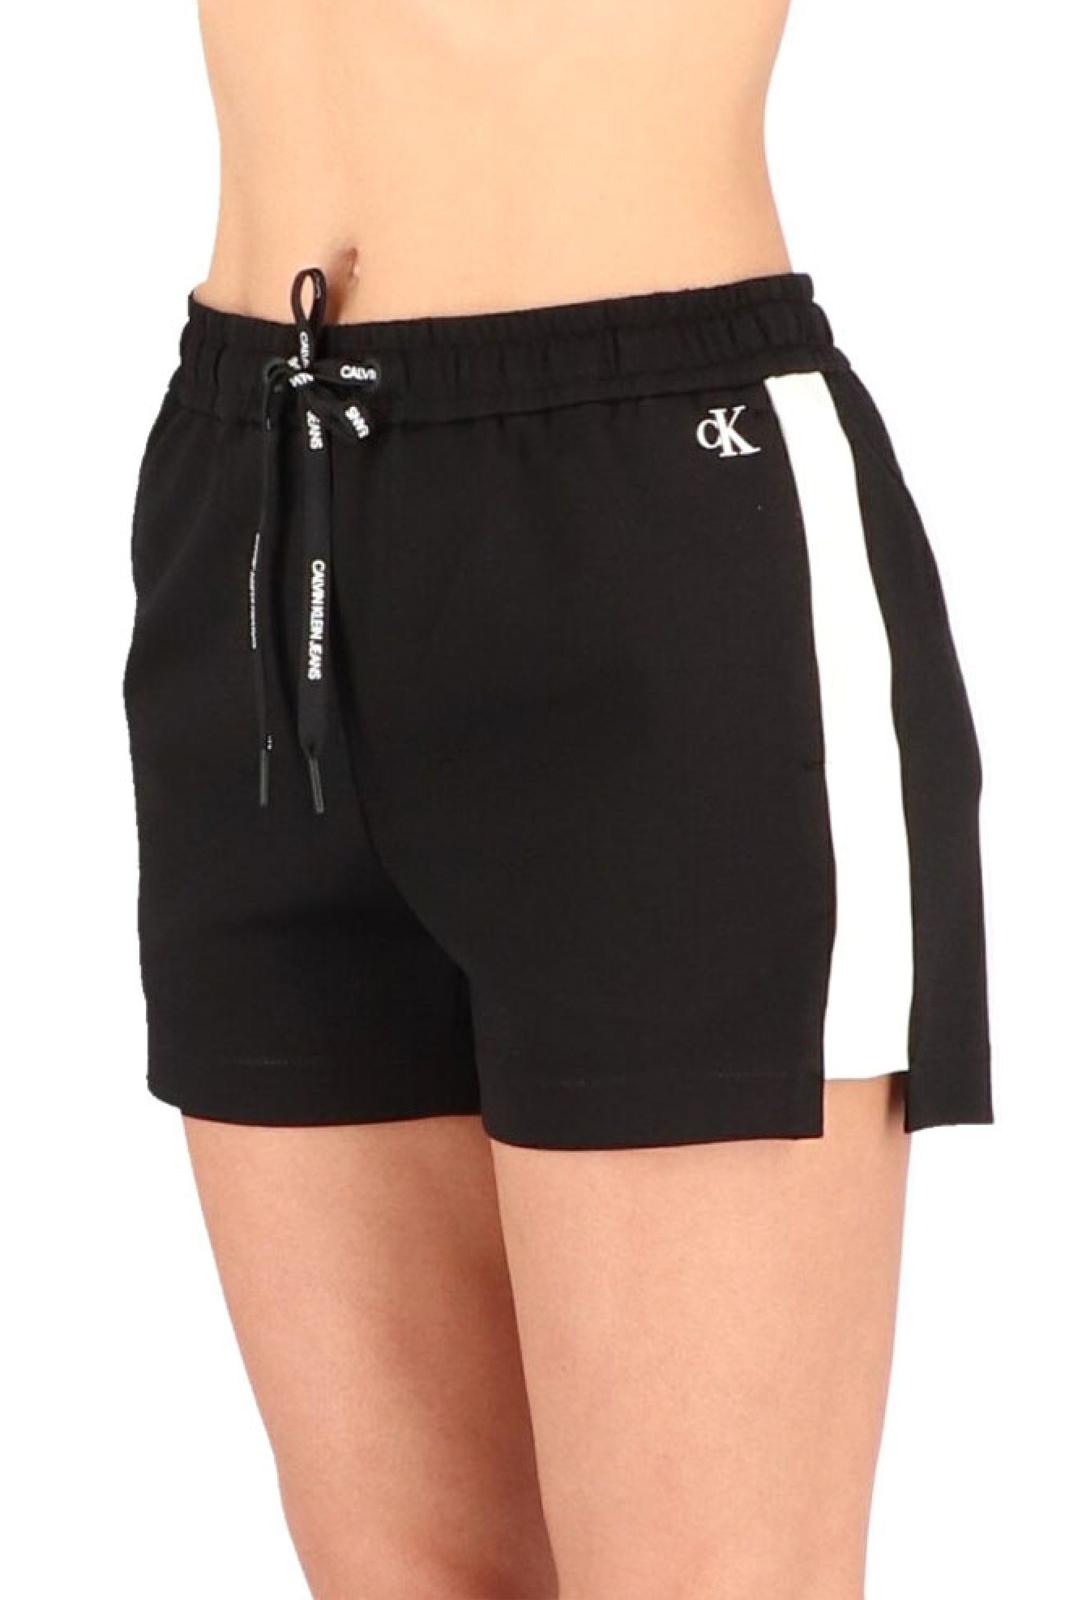 Shorts  Calvin klein J20J213593 BLOCKING BAE CK BLACK